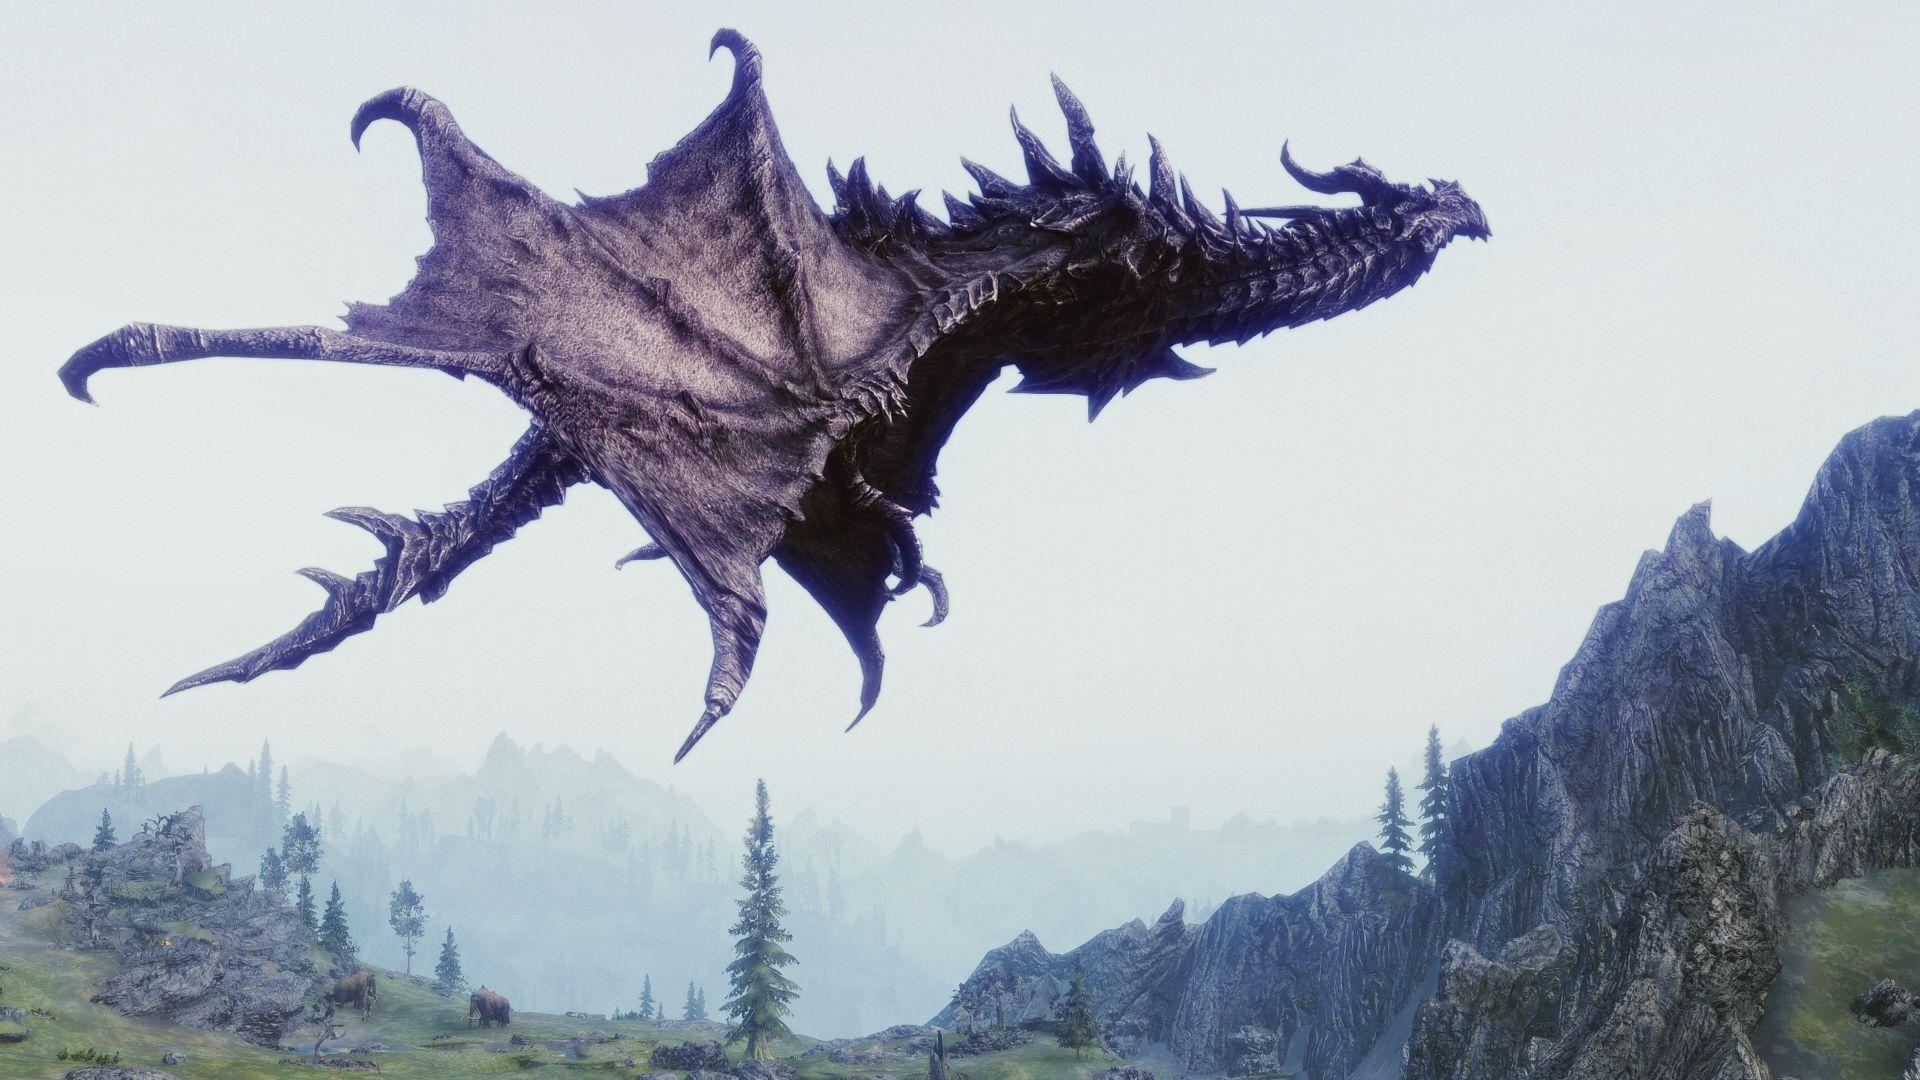 Dragons Uhd At Skyrim Nexus Mods Realistic Dragon Skyrim Nexus Mods Dragon